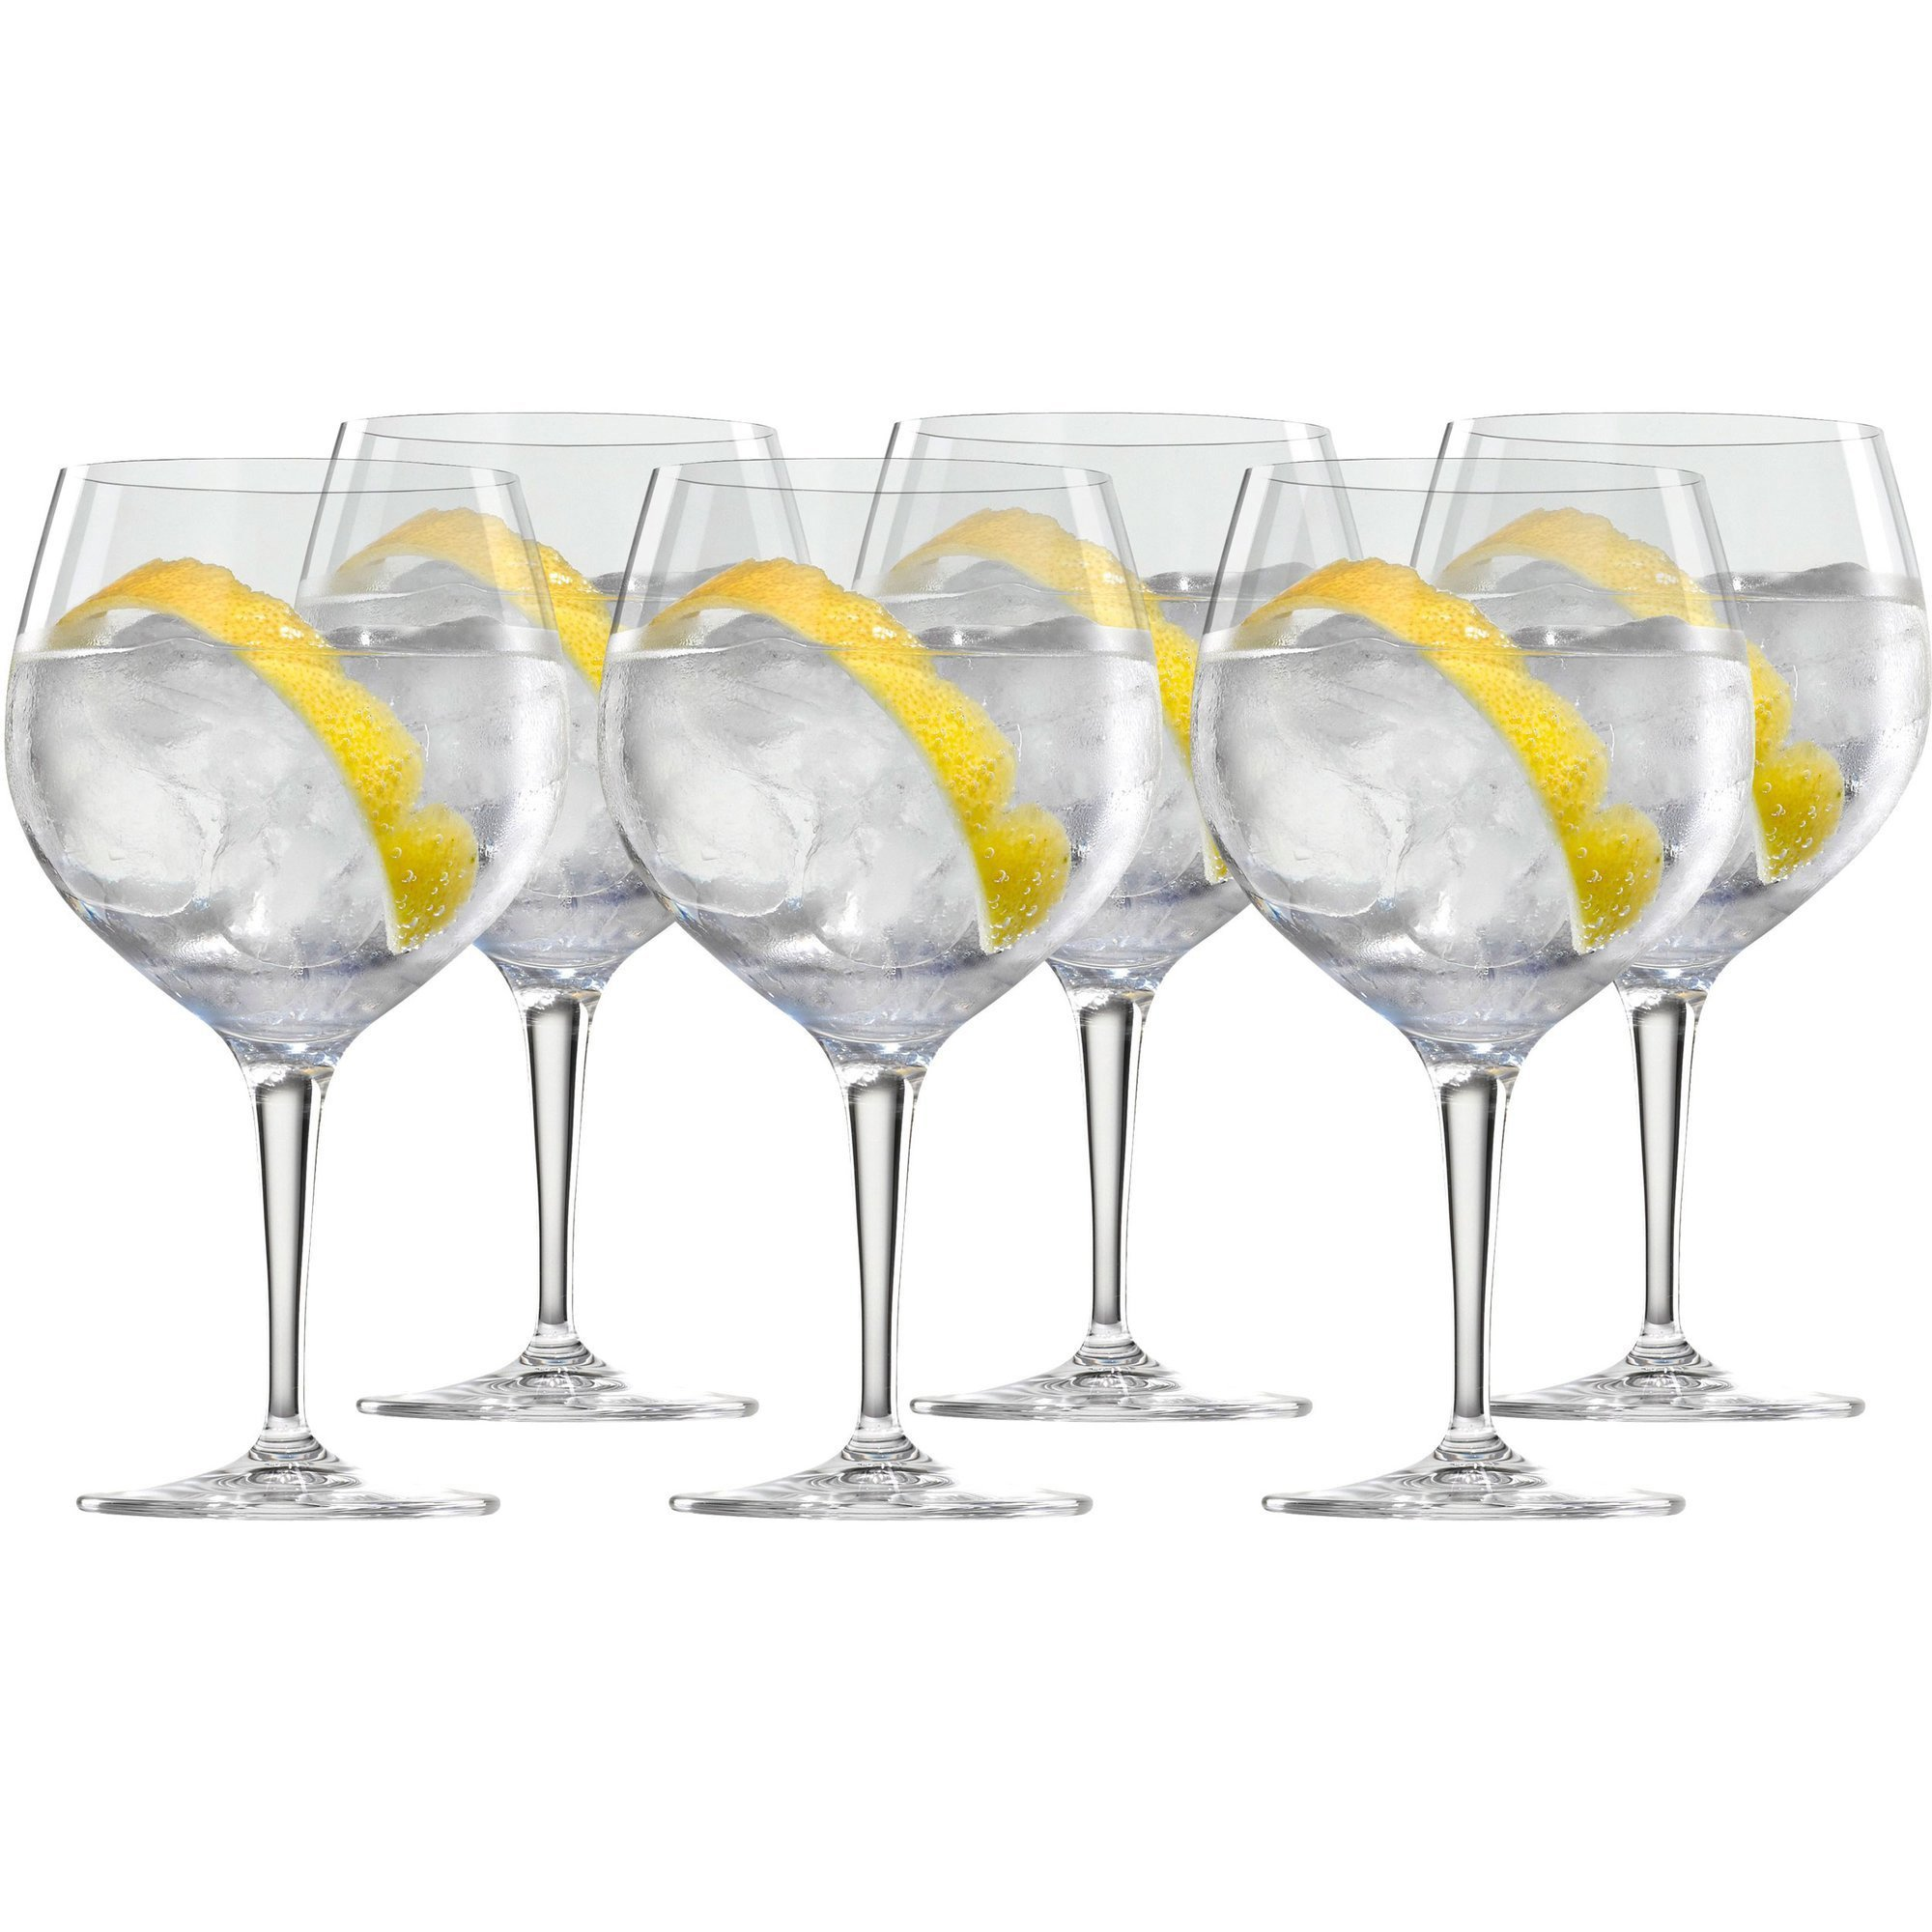 Spiegelau Gin & Tonic glas 6 st.